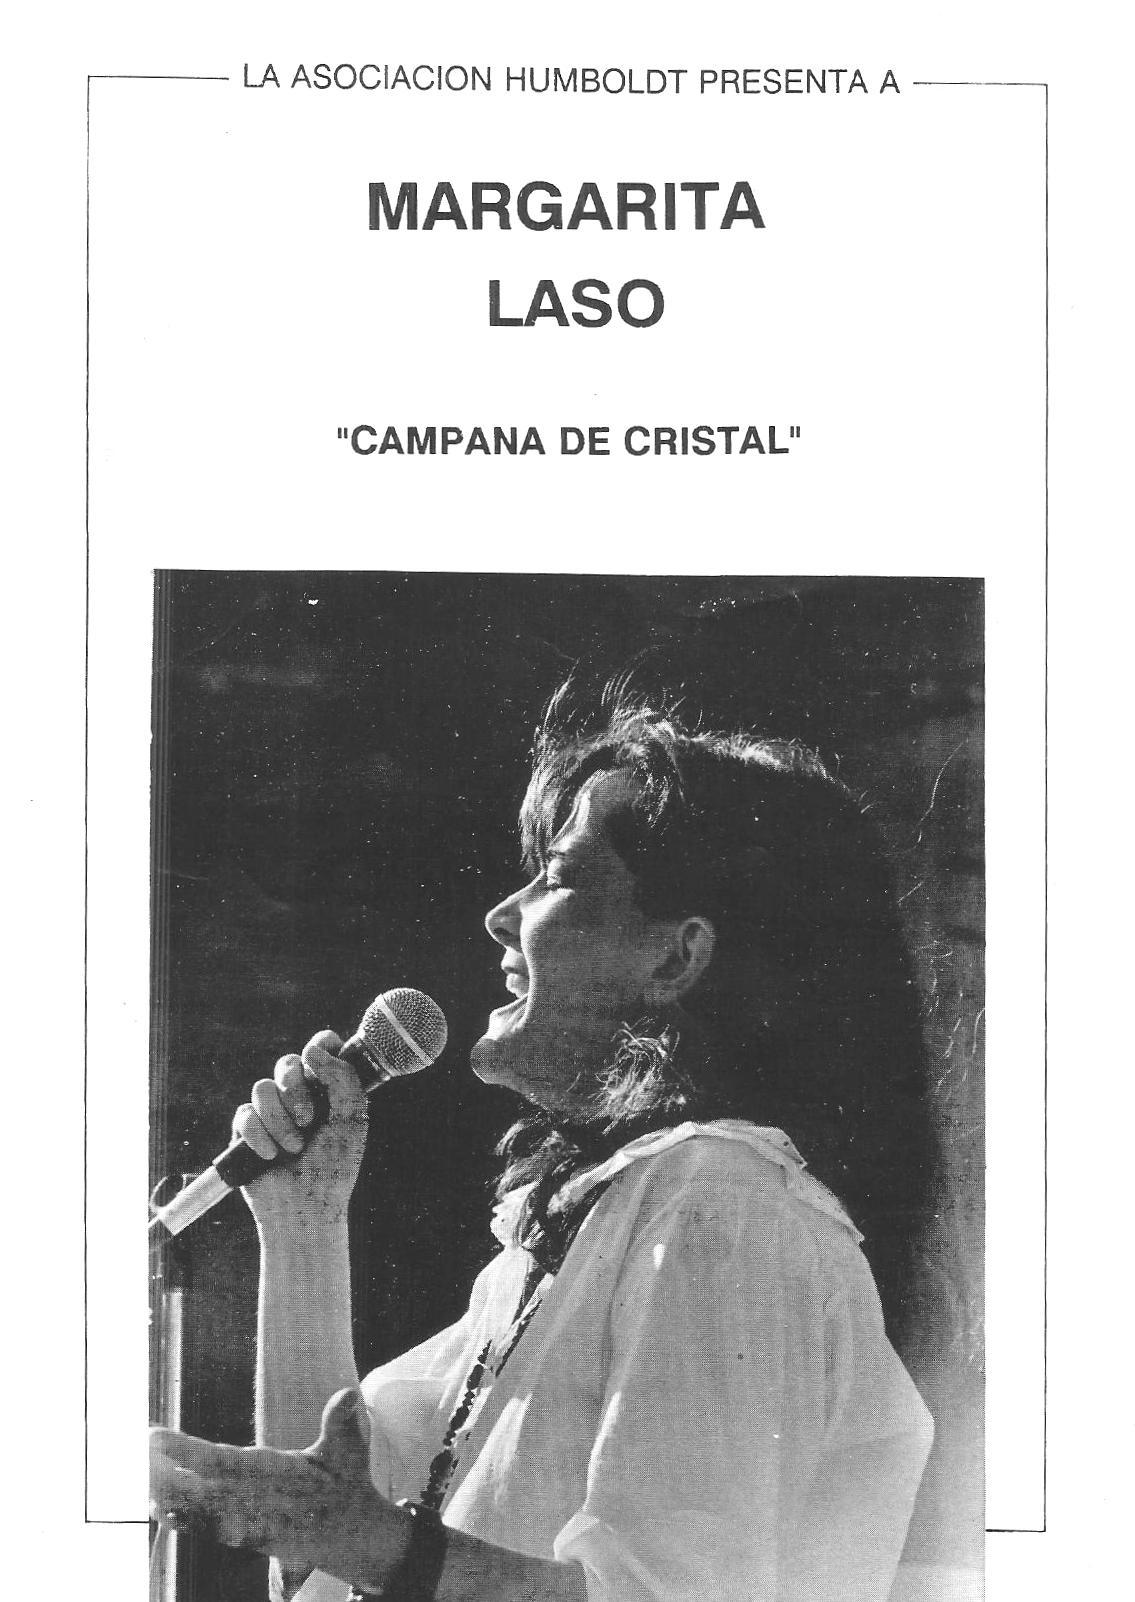 campana de cristal, 1989